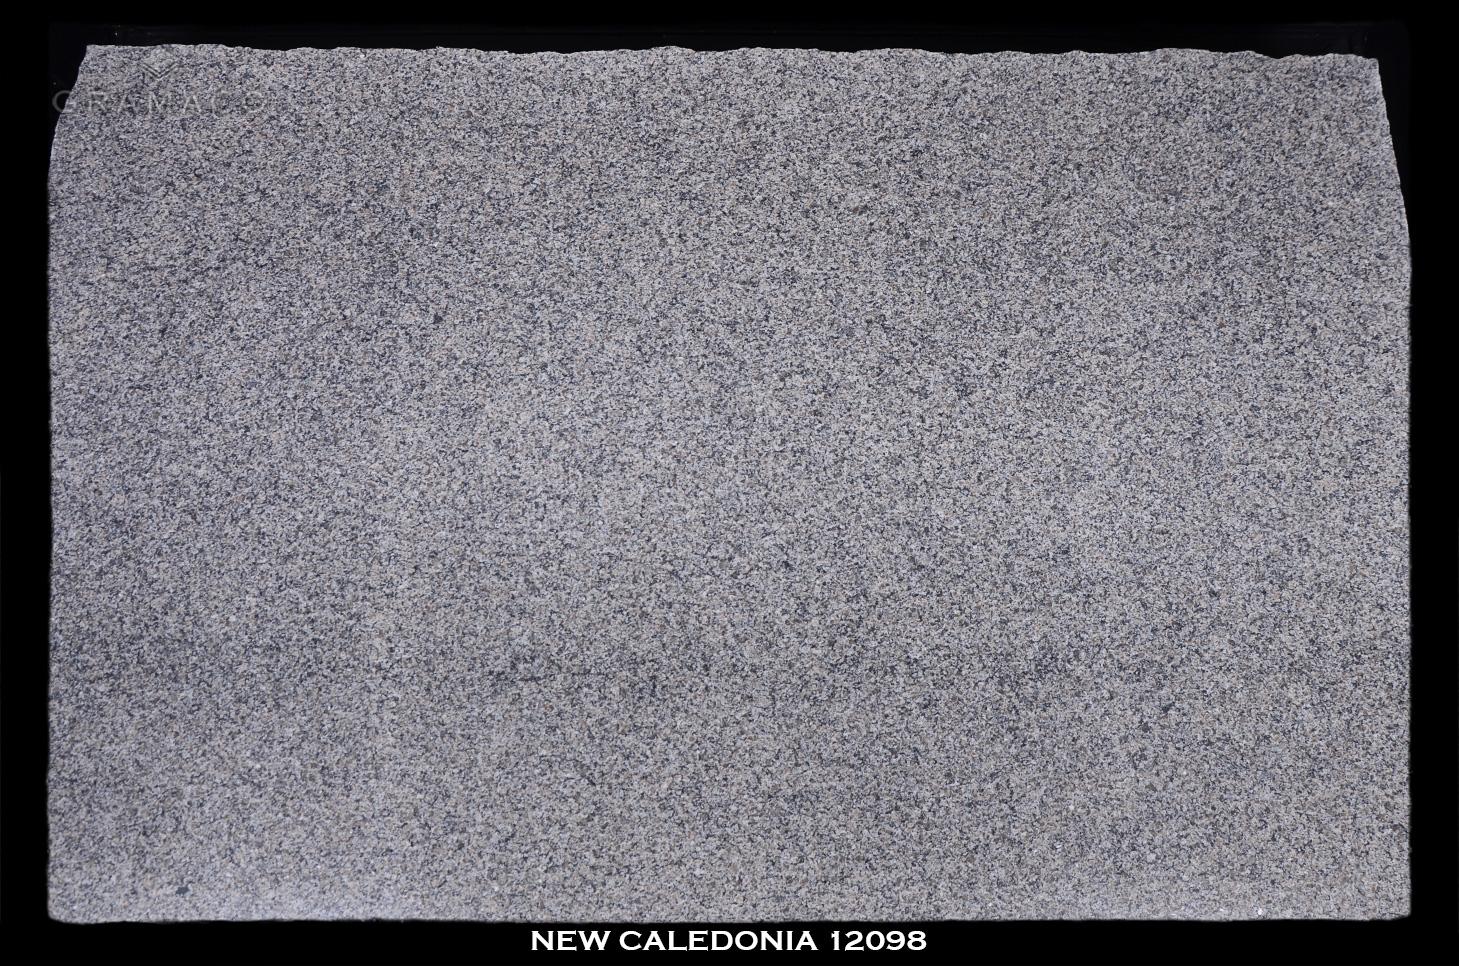 NEW-CALEDONIA-12098